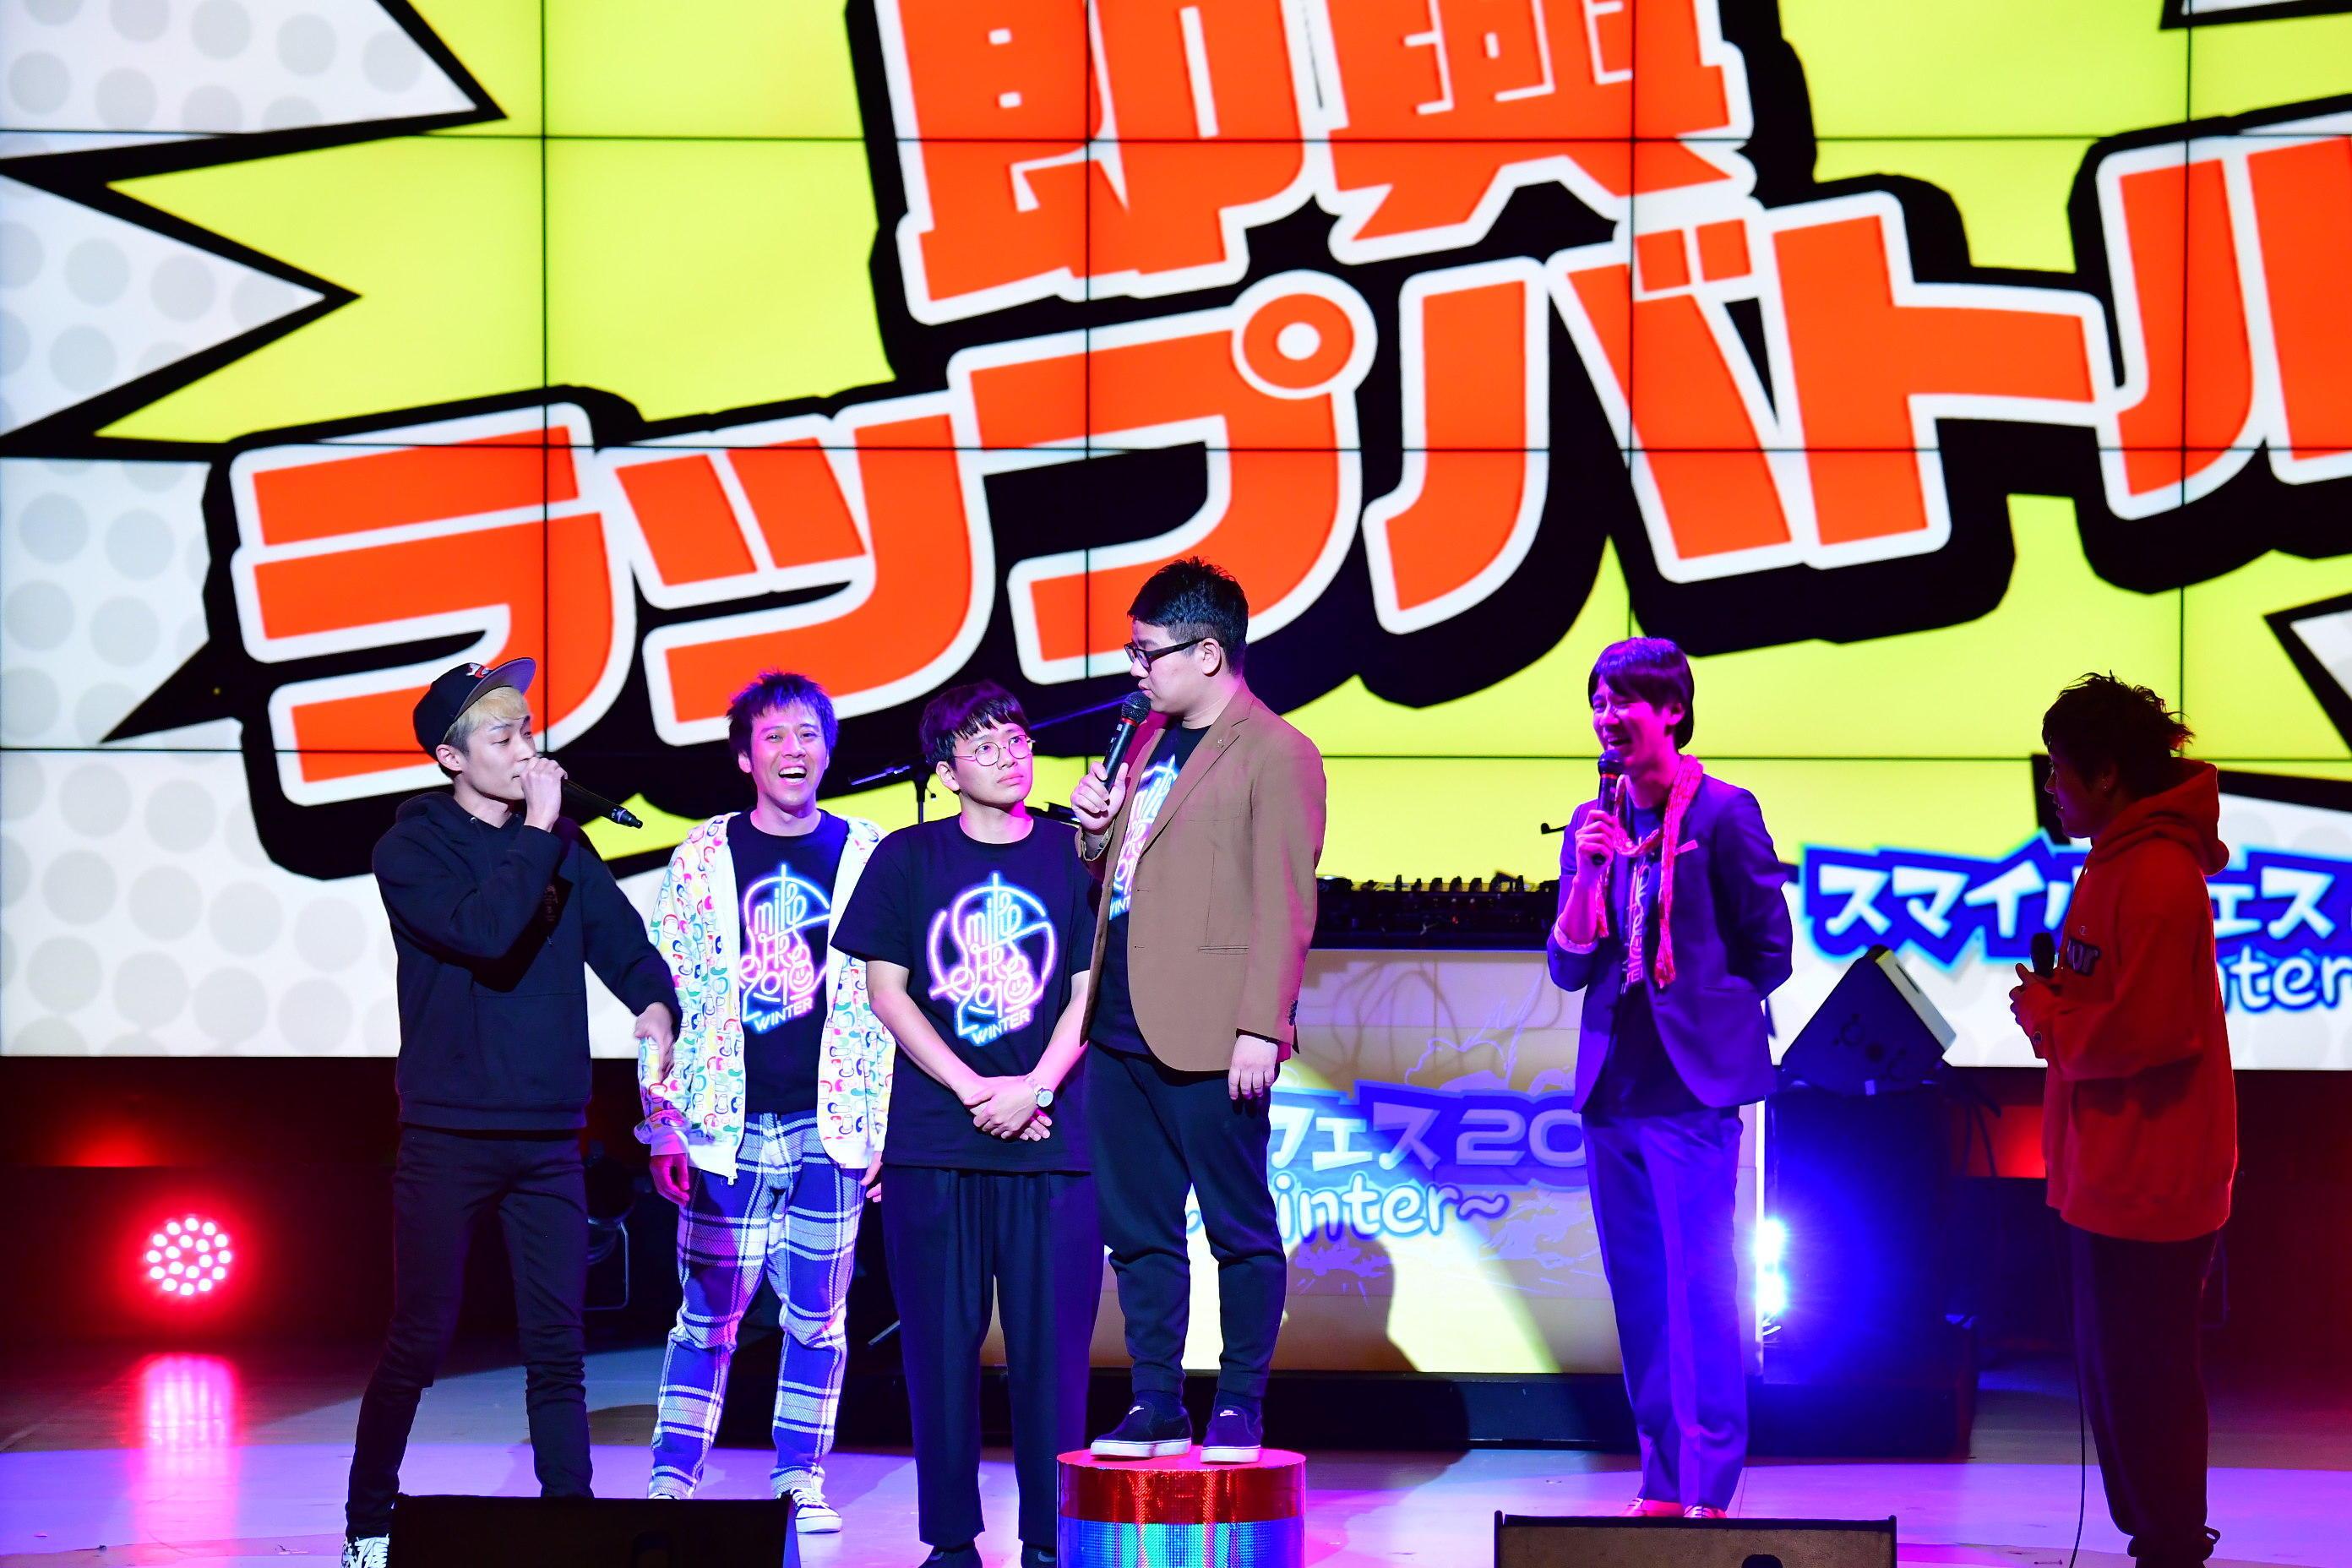 http://news.yoshimoto.co.jp/20180119011435-00b2f7c2839a0257a35cad2c56319fc459716e06.jpg